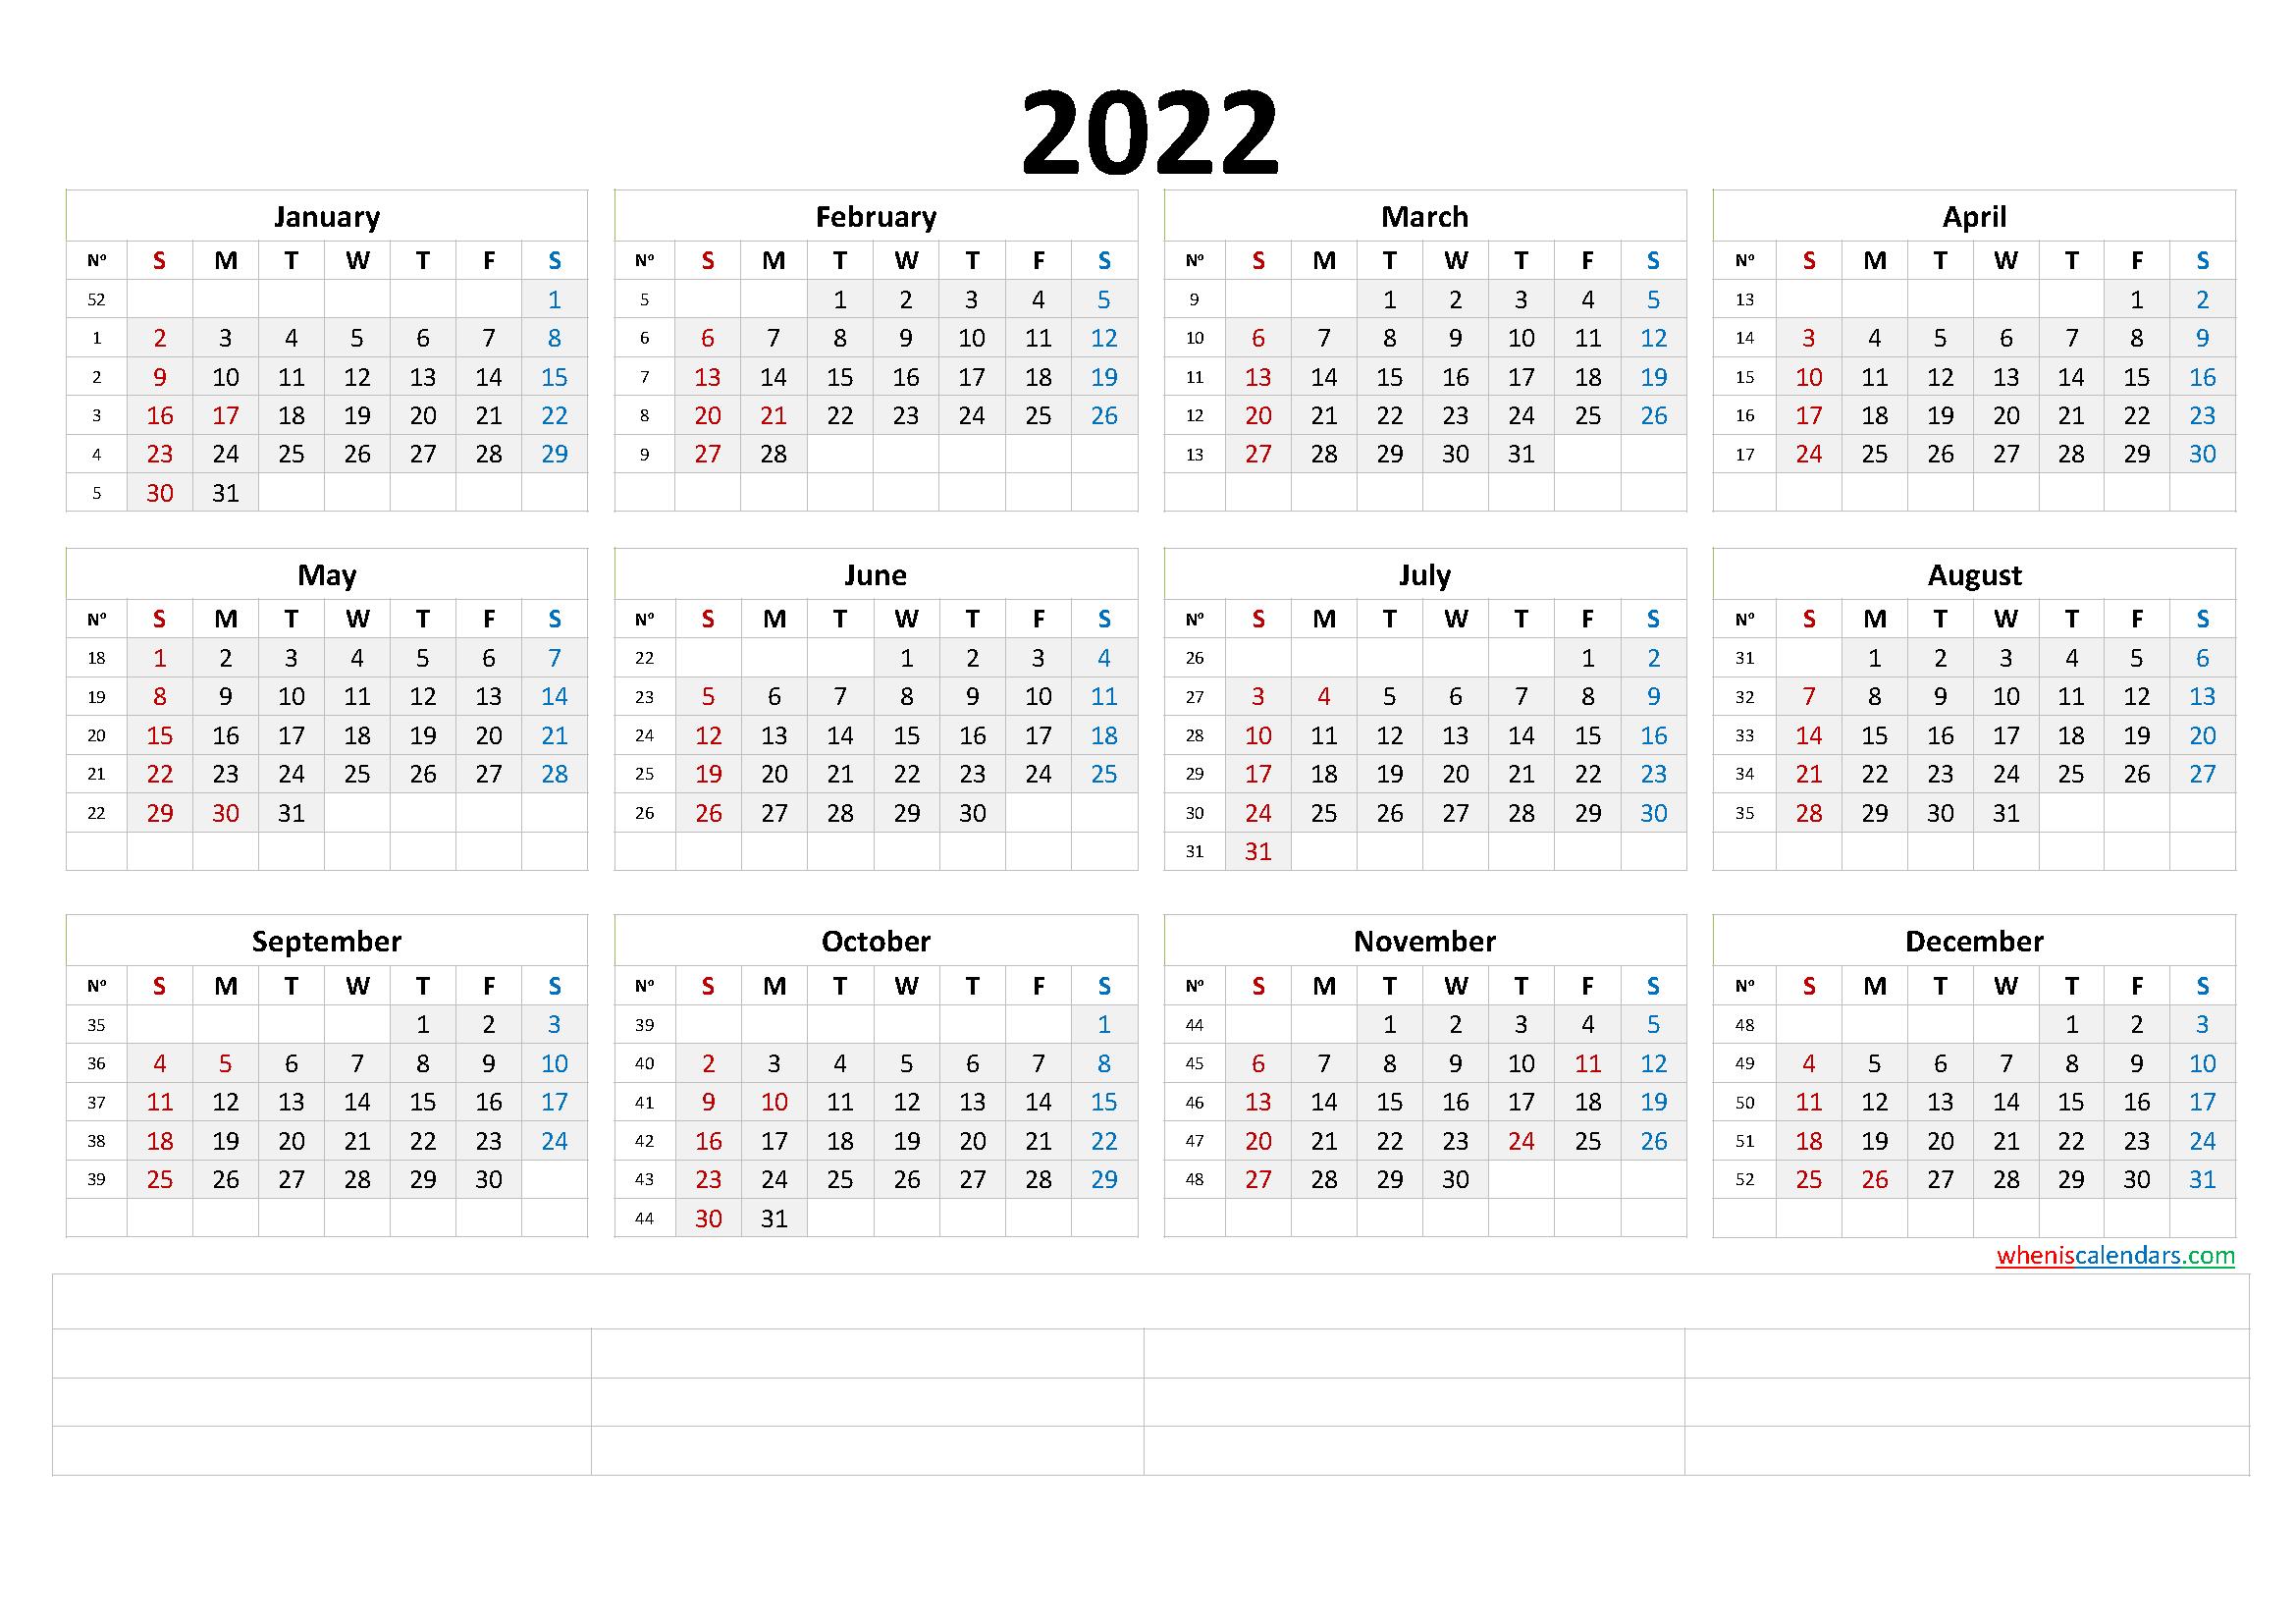 2022 Annual Calendar.2022 Annual Calendar Printable Premium Templates Free Printable 2021 Monthly Calendar With Holidays